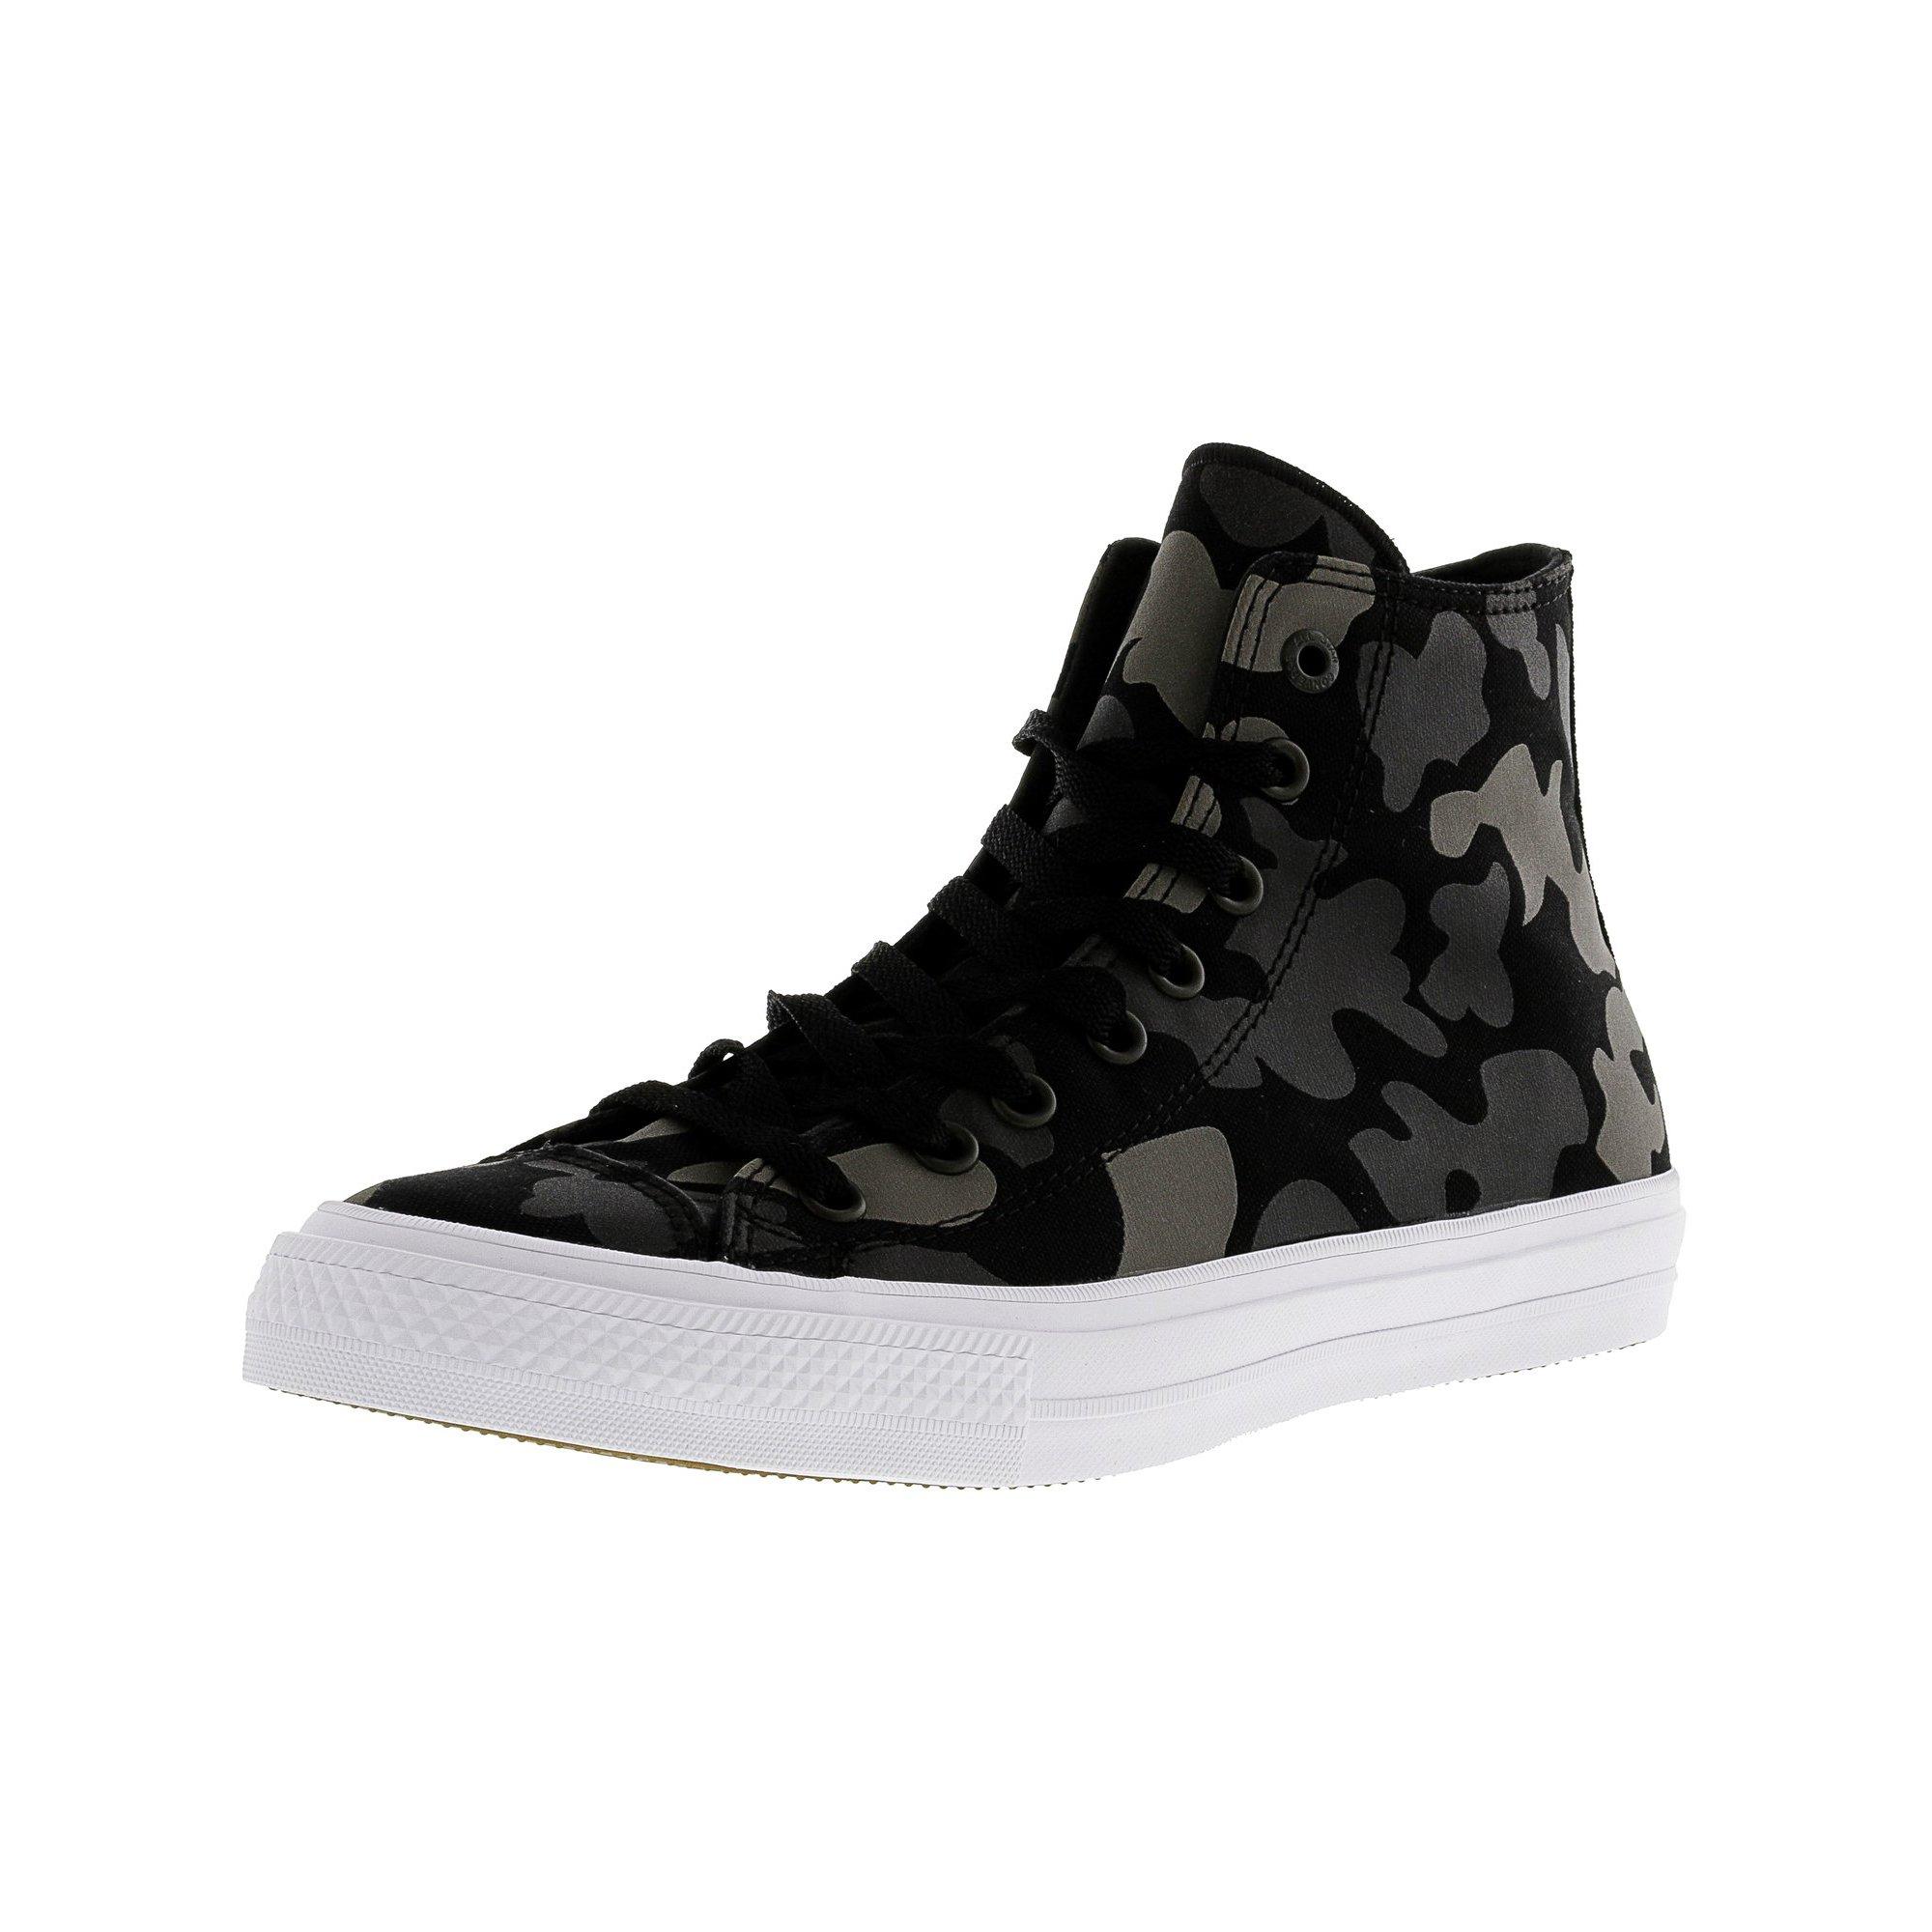 53ea143933162c Converse Chuck Taylor All Star Ii Hi Black   Volt Green High-Top Canvas  Fashion Sneaker - 12M 10M